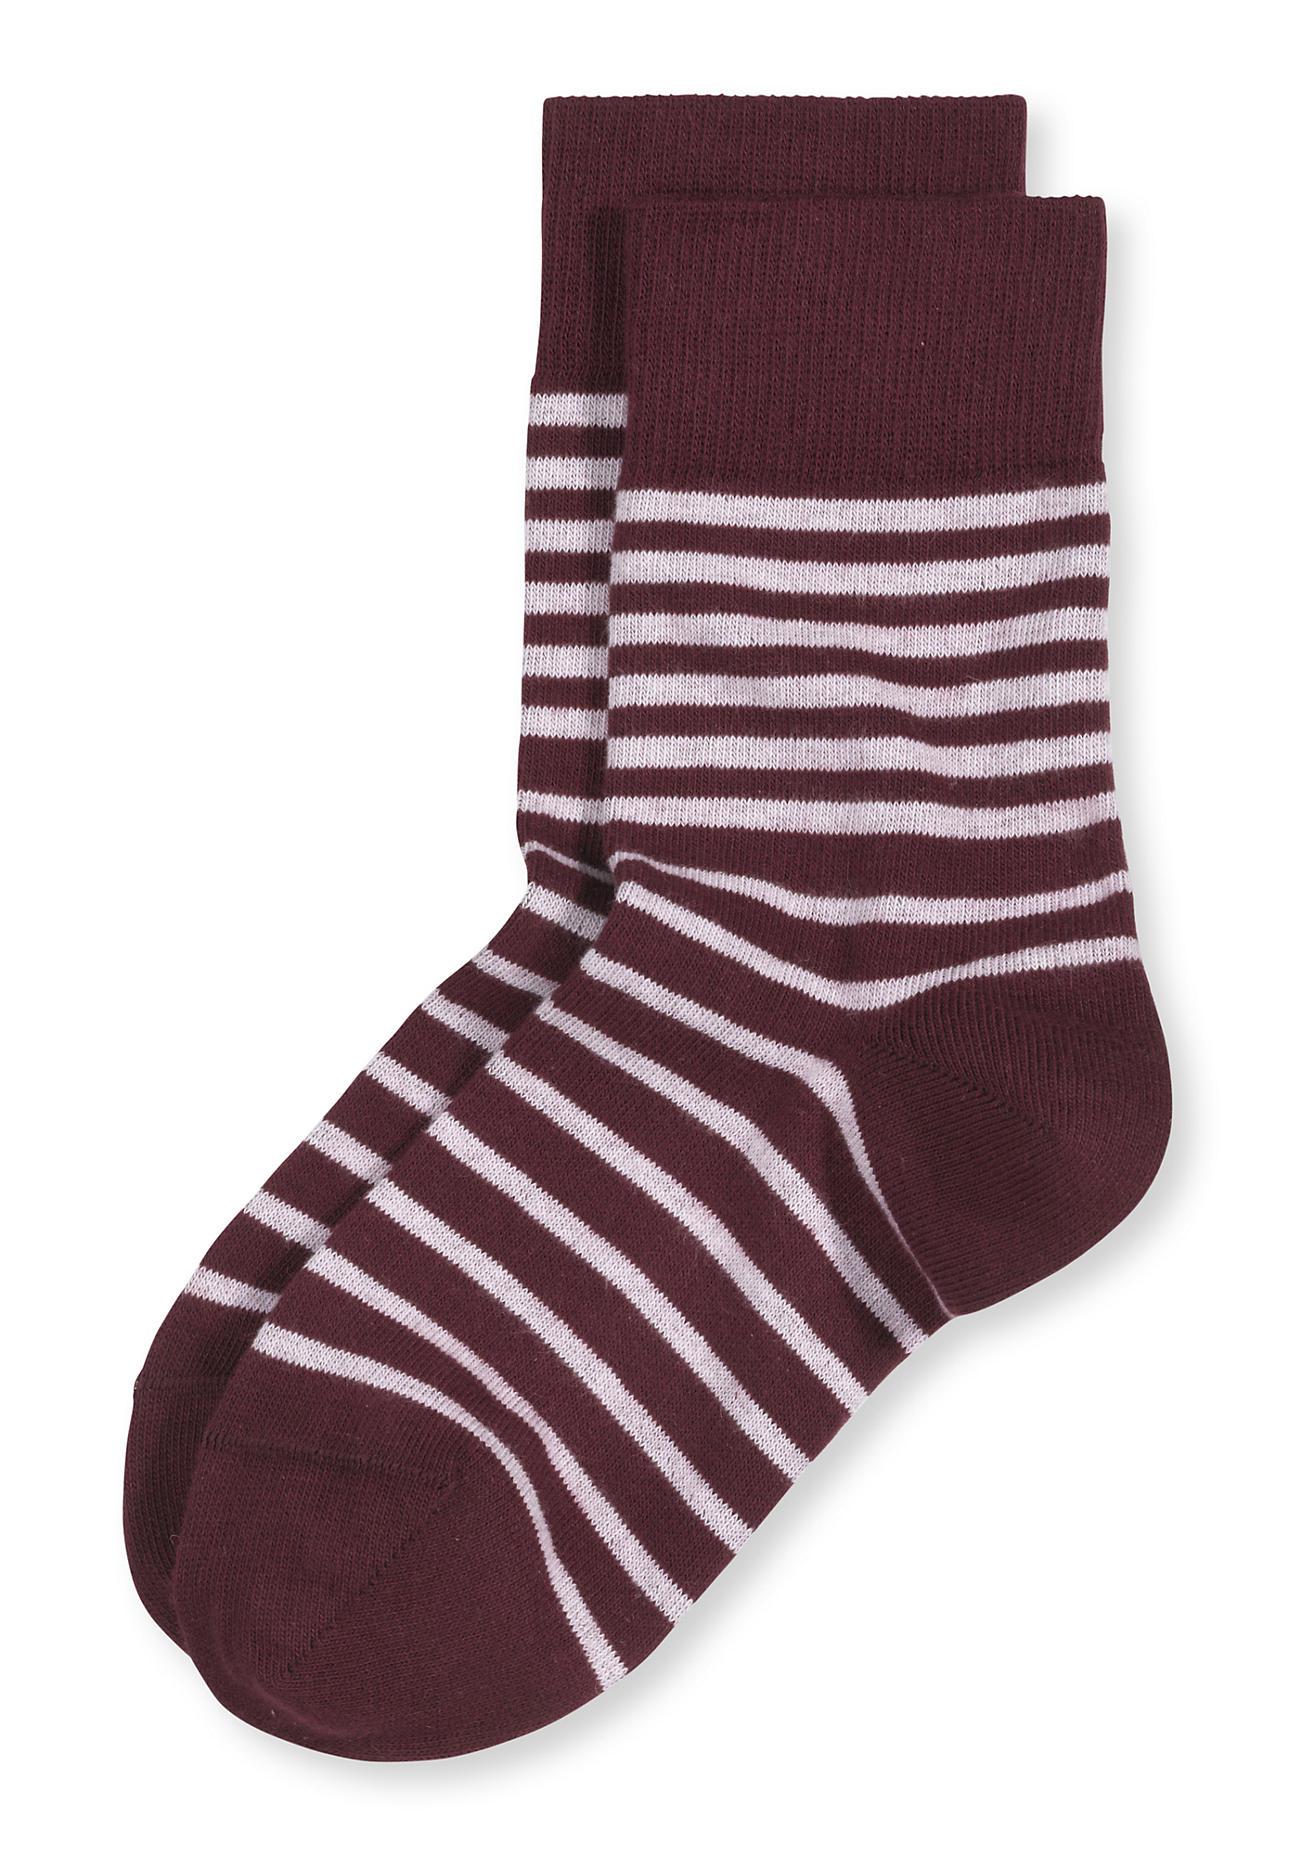 Socken - hessnatur Unisex Socke aus Bio Baumwolle – rot –  - Onlineshop Hessnatur